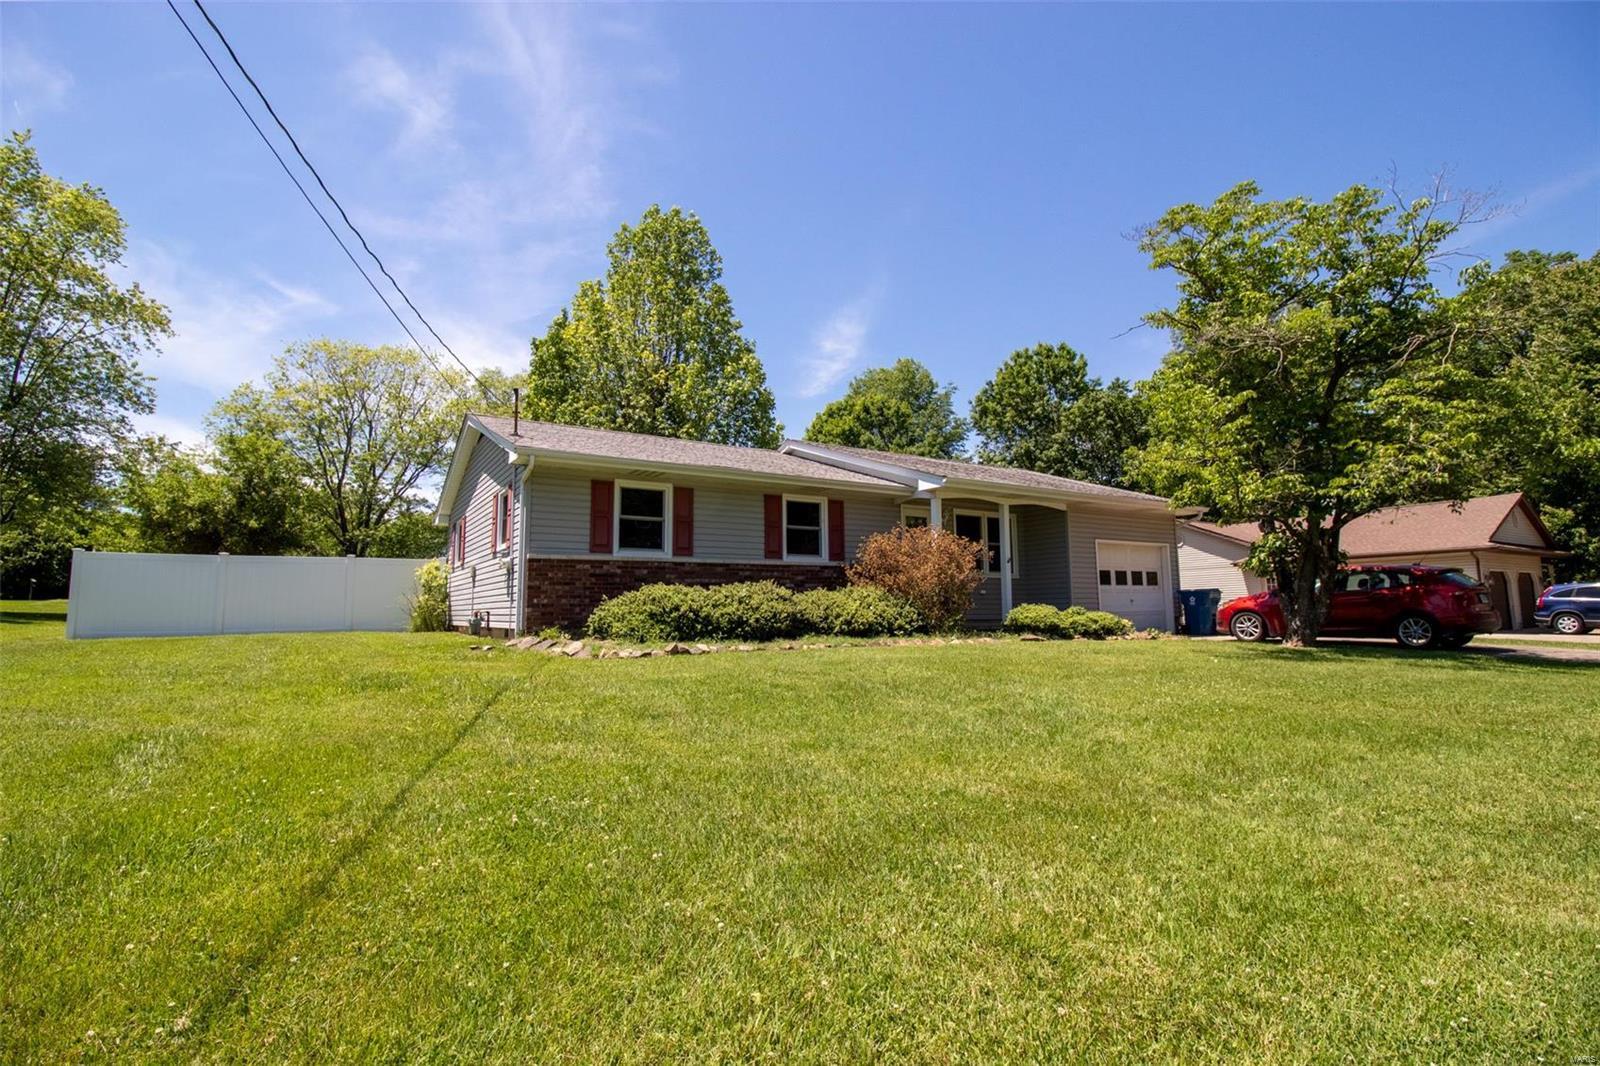 207 S Greenbriar Property Photo 1